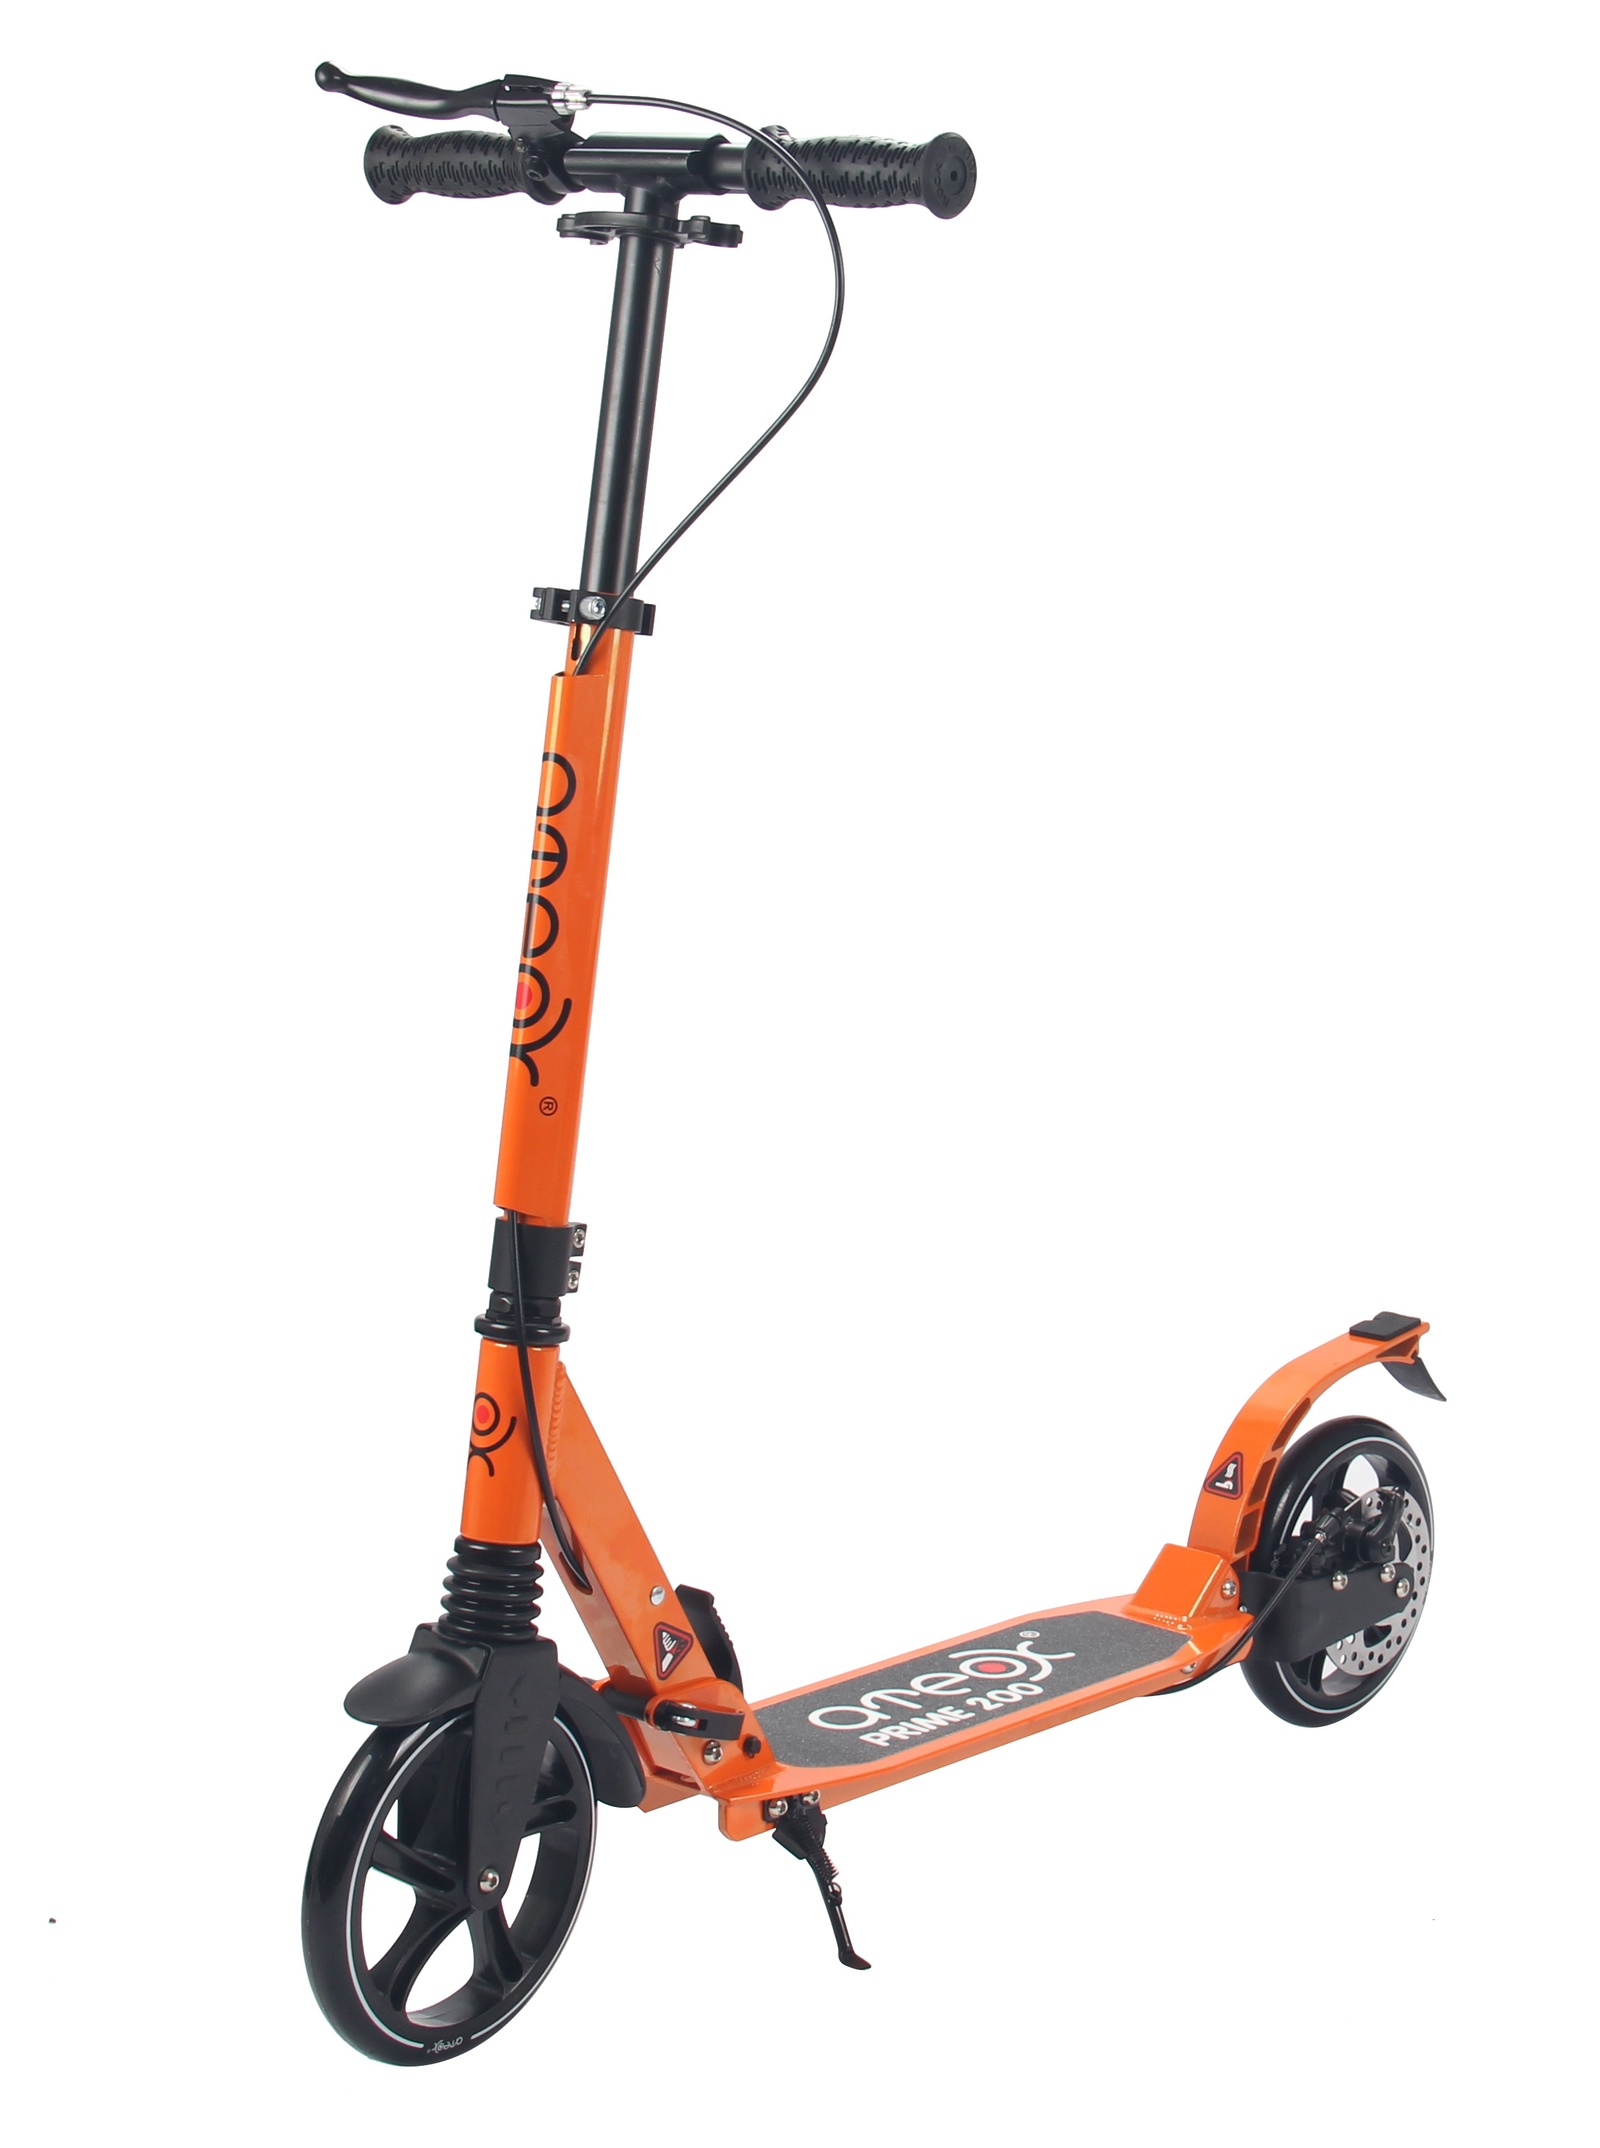 Самокат для взрослых Аteox PRIME 200 (Оранжевый)